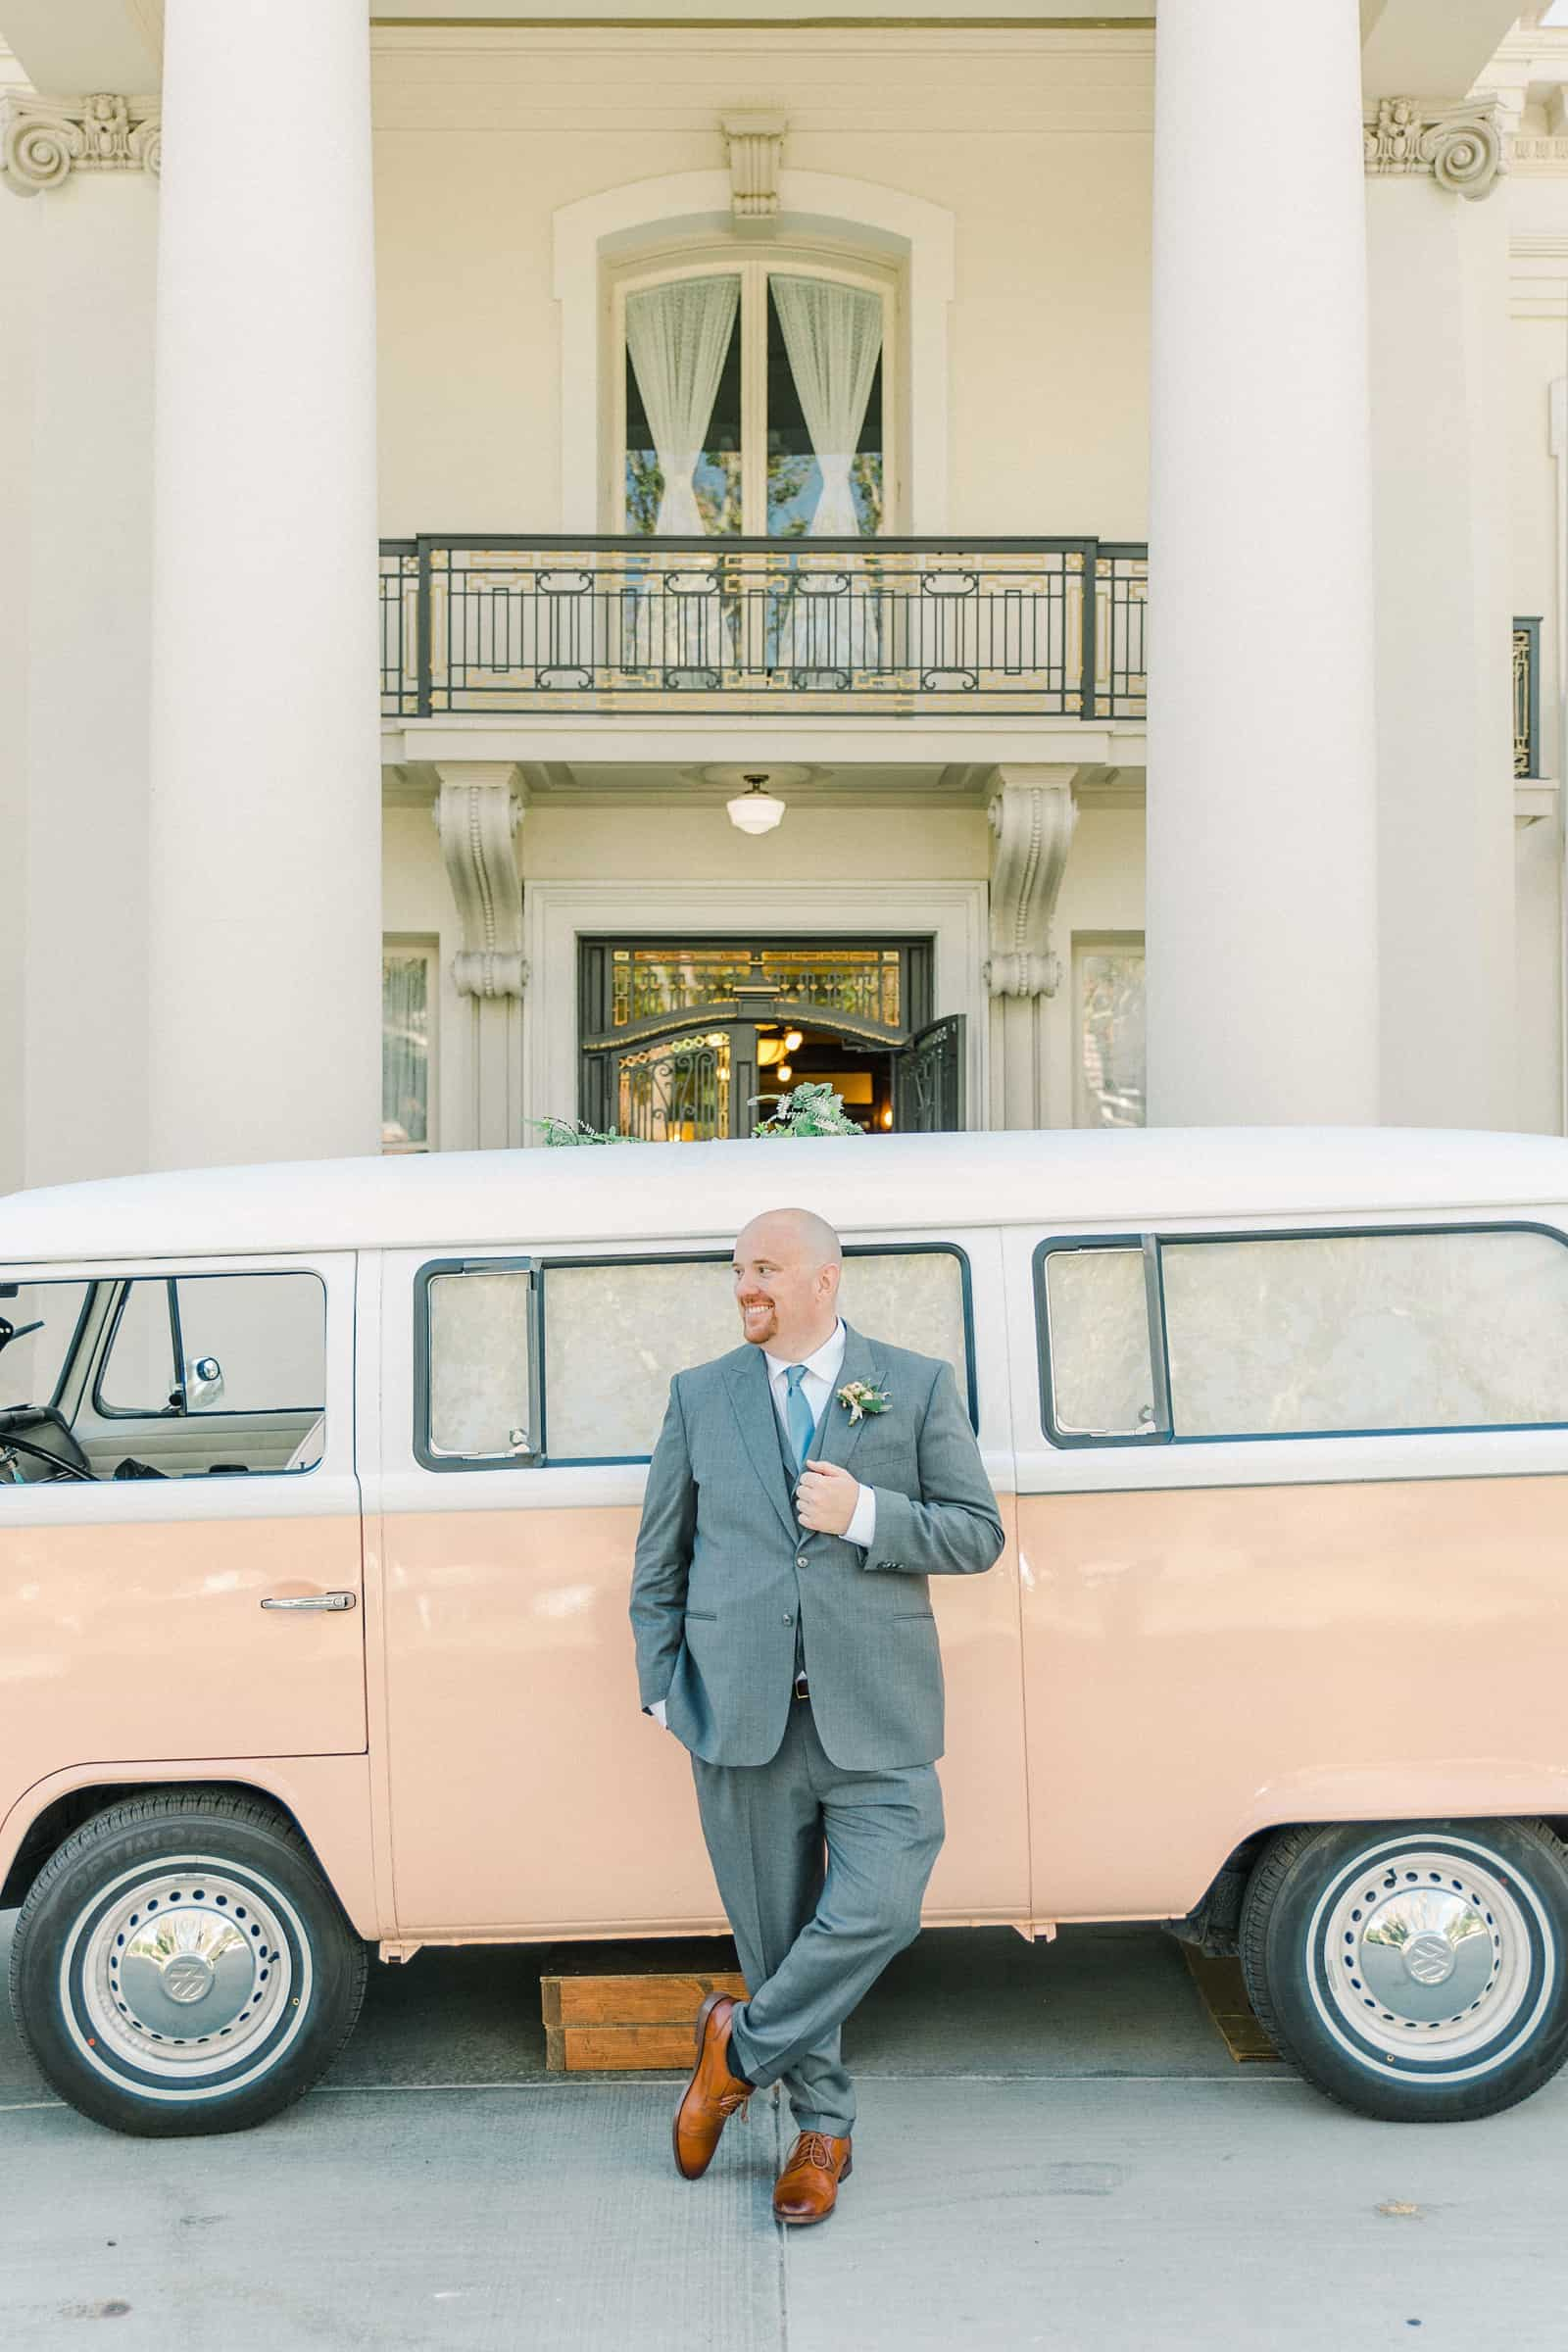 Thomas S. Monson Center Wedding, Salt Lake LDS Temple Wedding, Utah wedding photography. groom with vintage pink VW photo bus